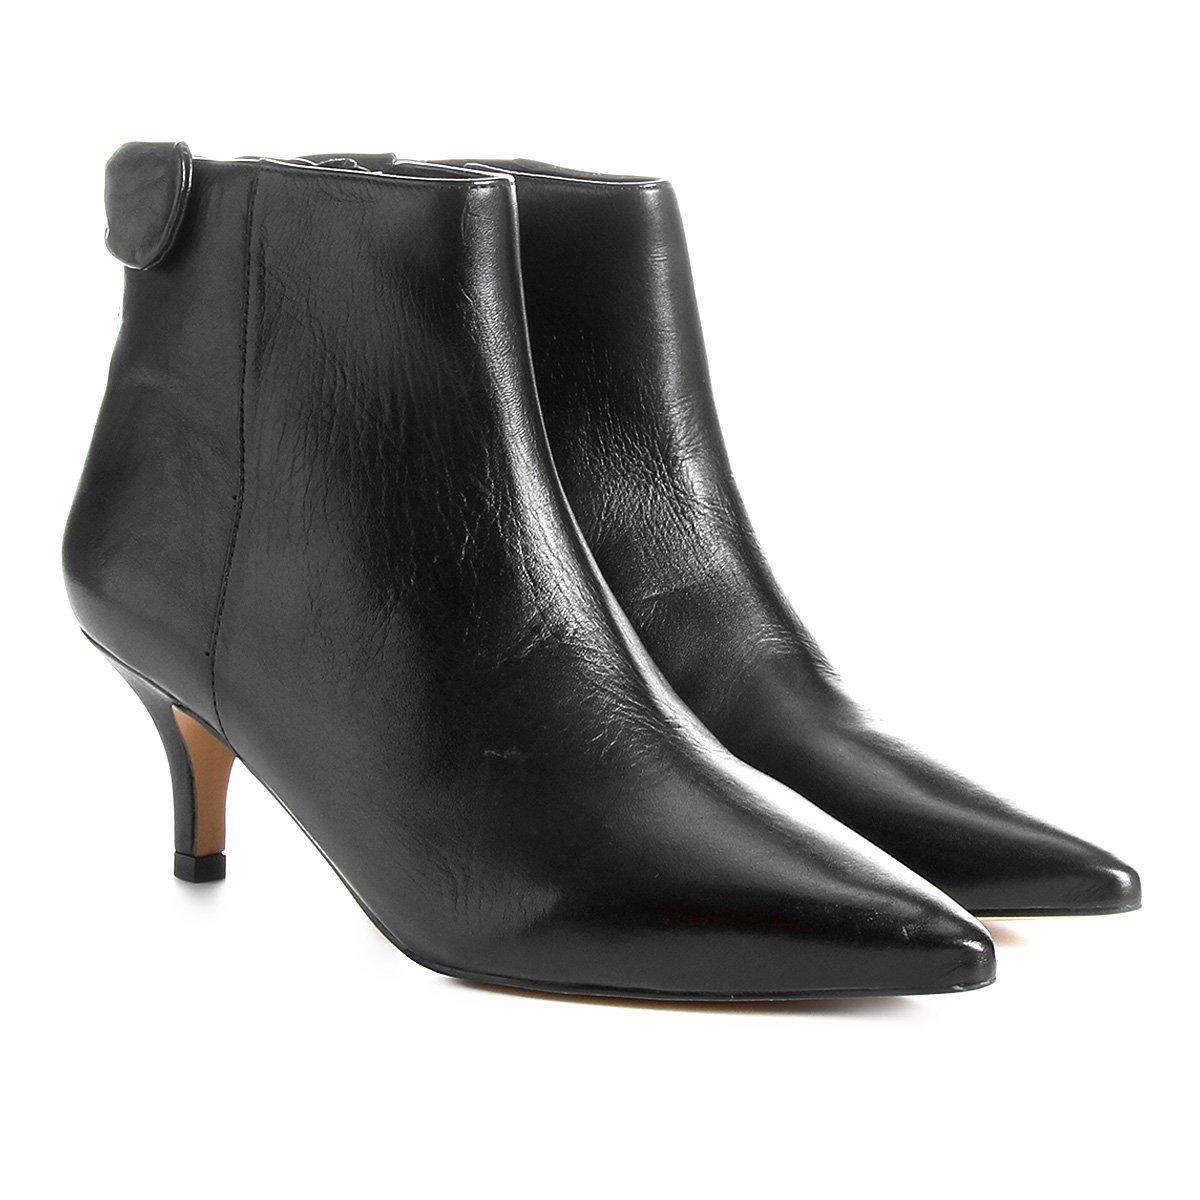 28cf86934 Bota Couro Cano Curto Shoestock Nó Salto Curto Feminina | Shoestock